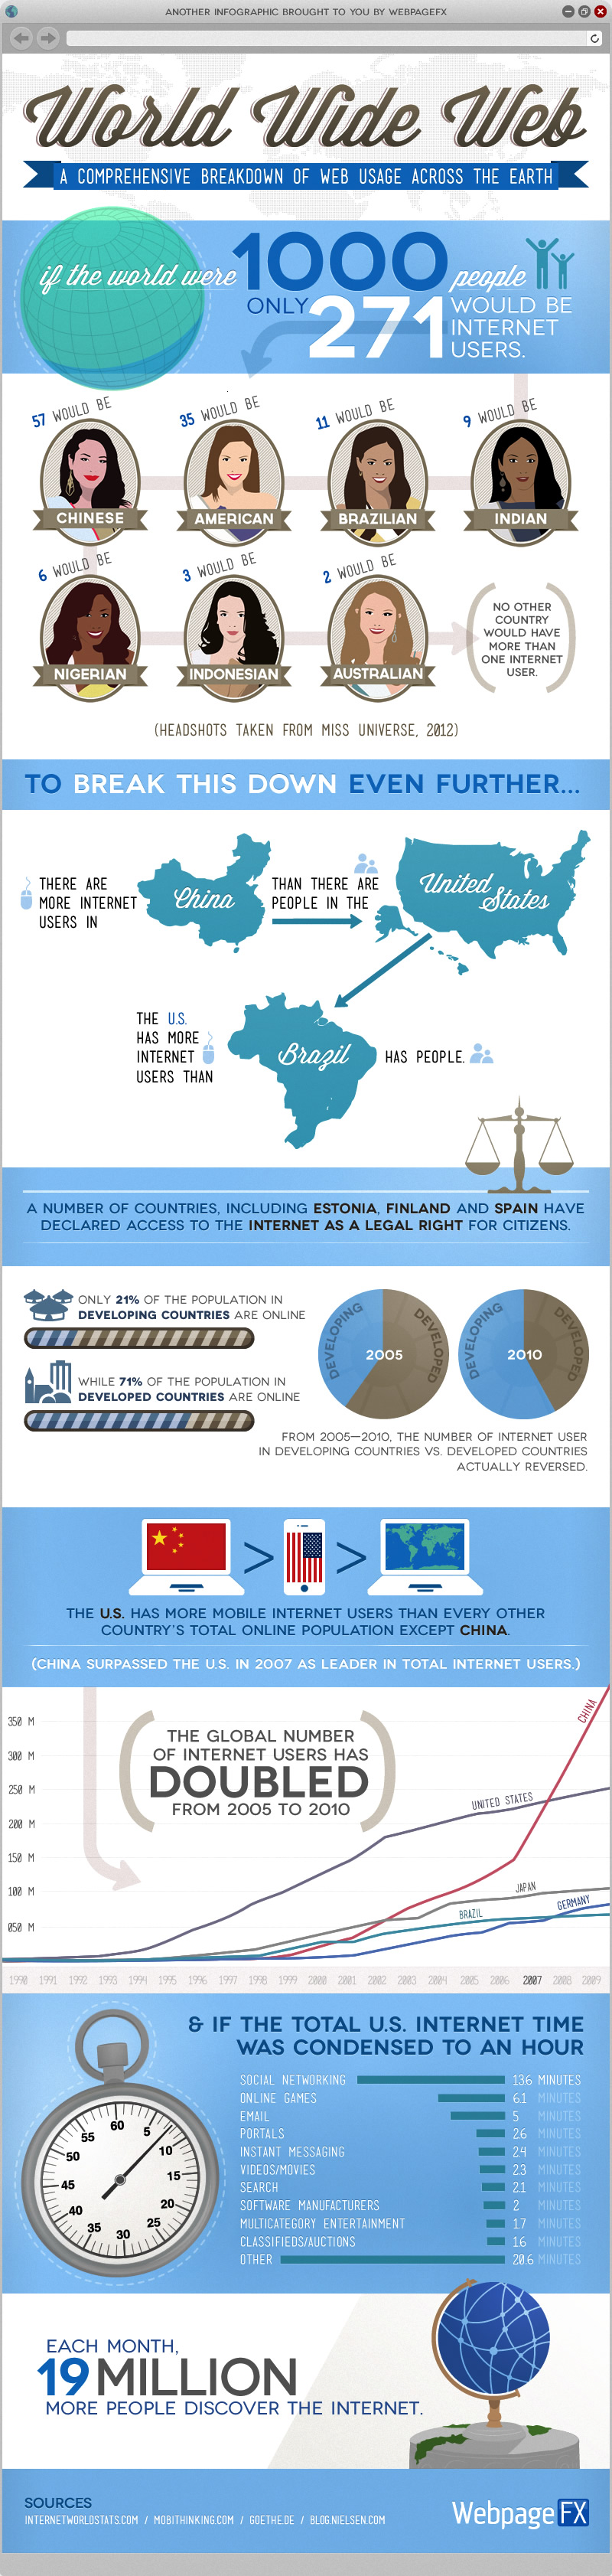 Internet-usage-infographic-blog